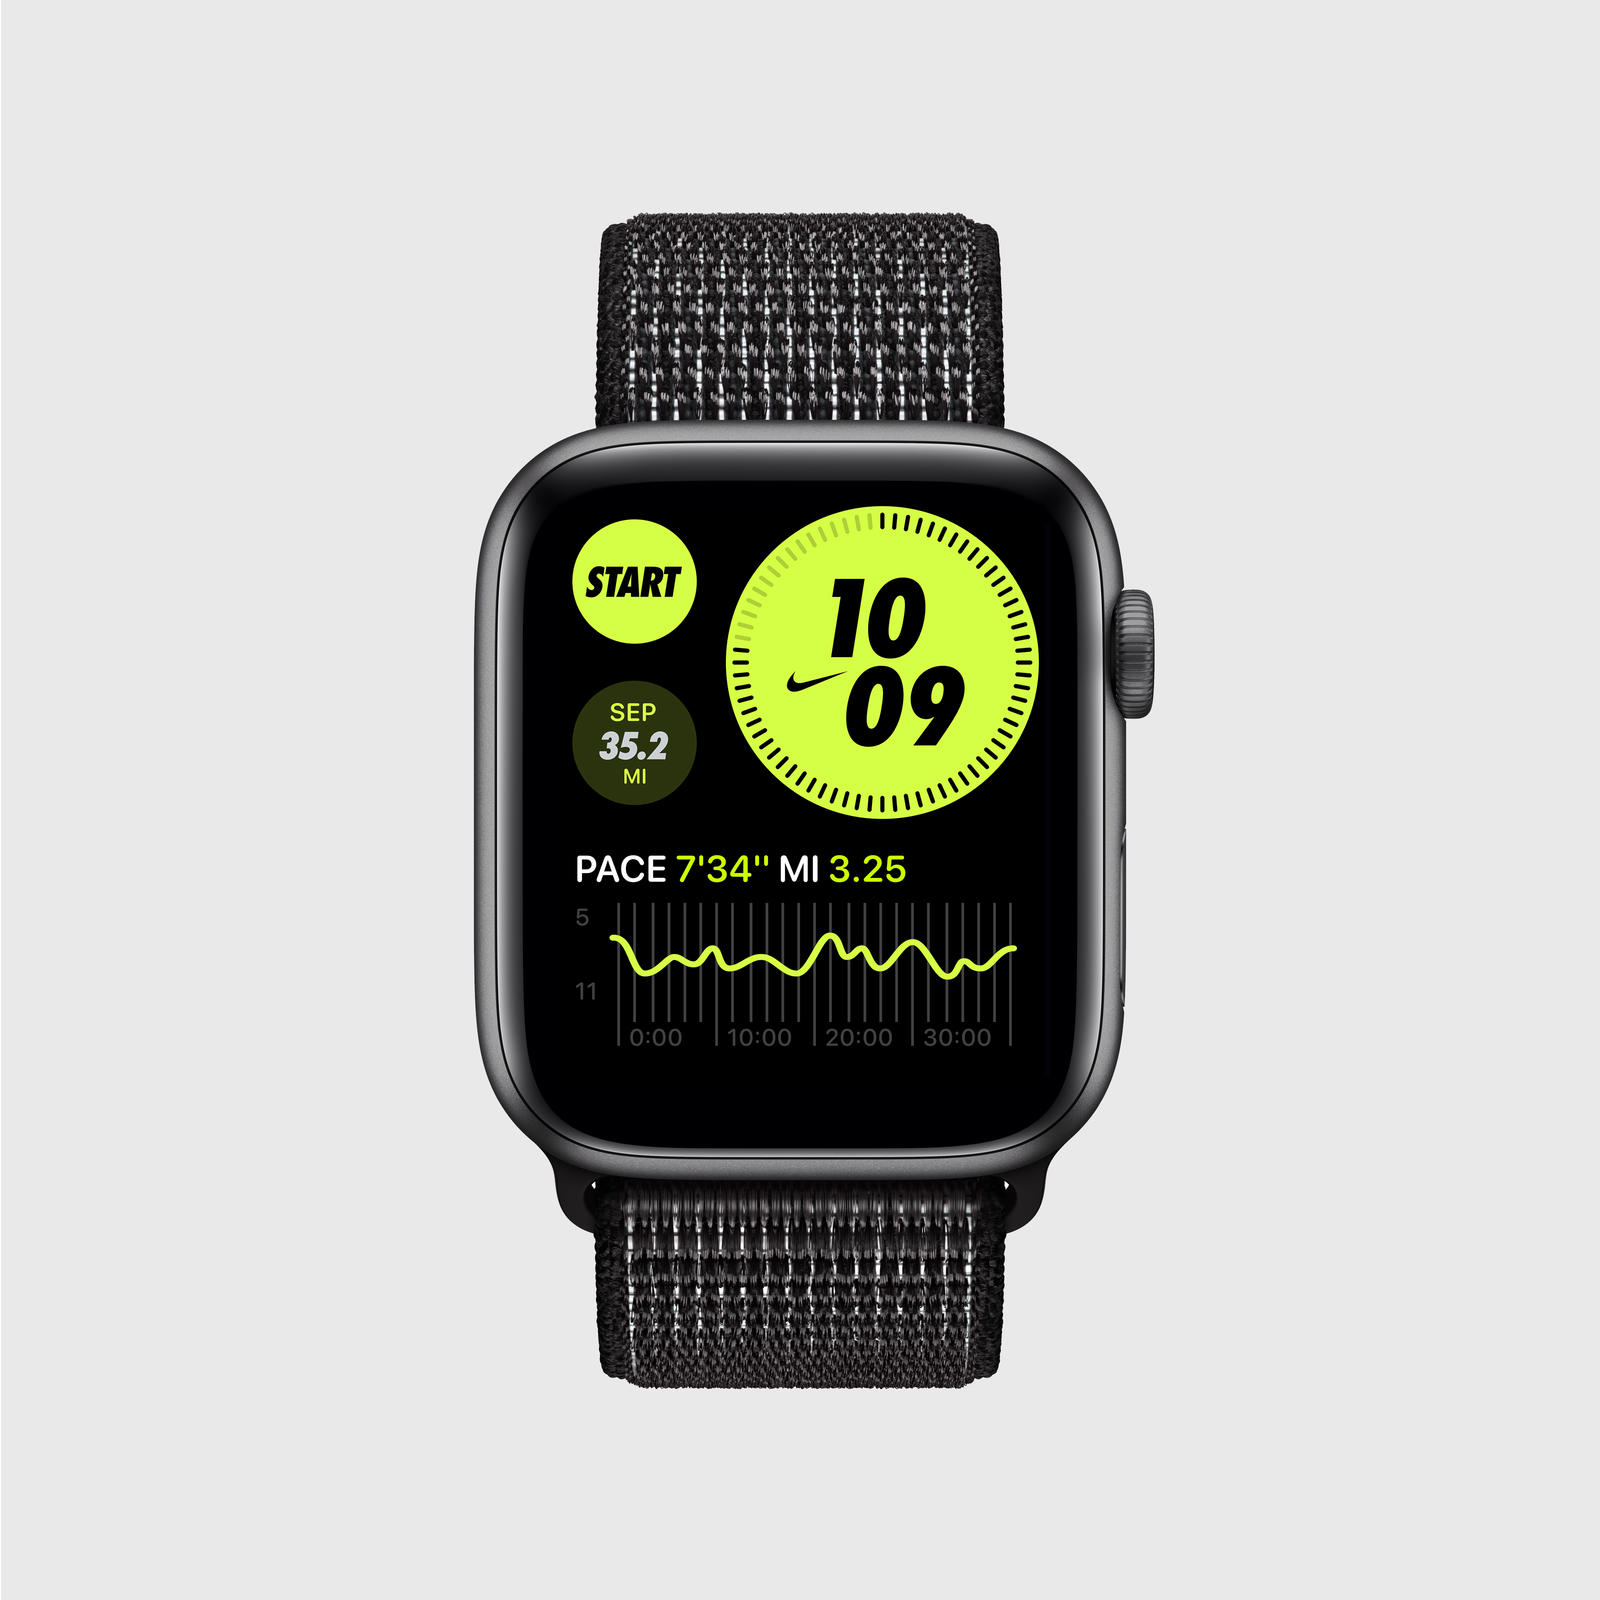 Nike Run Club Updates to Apple Watch